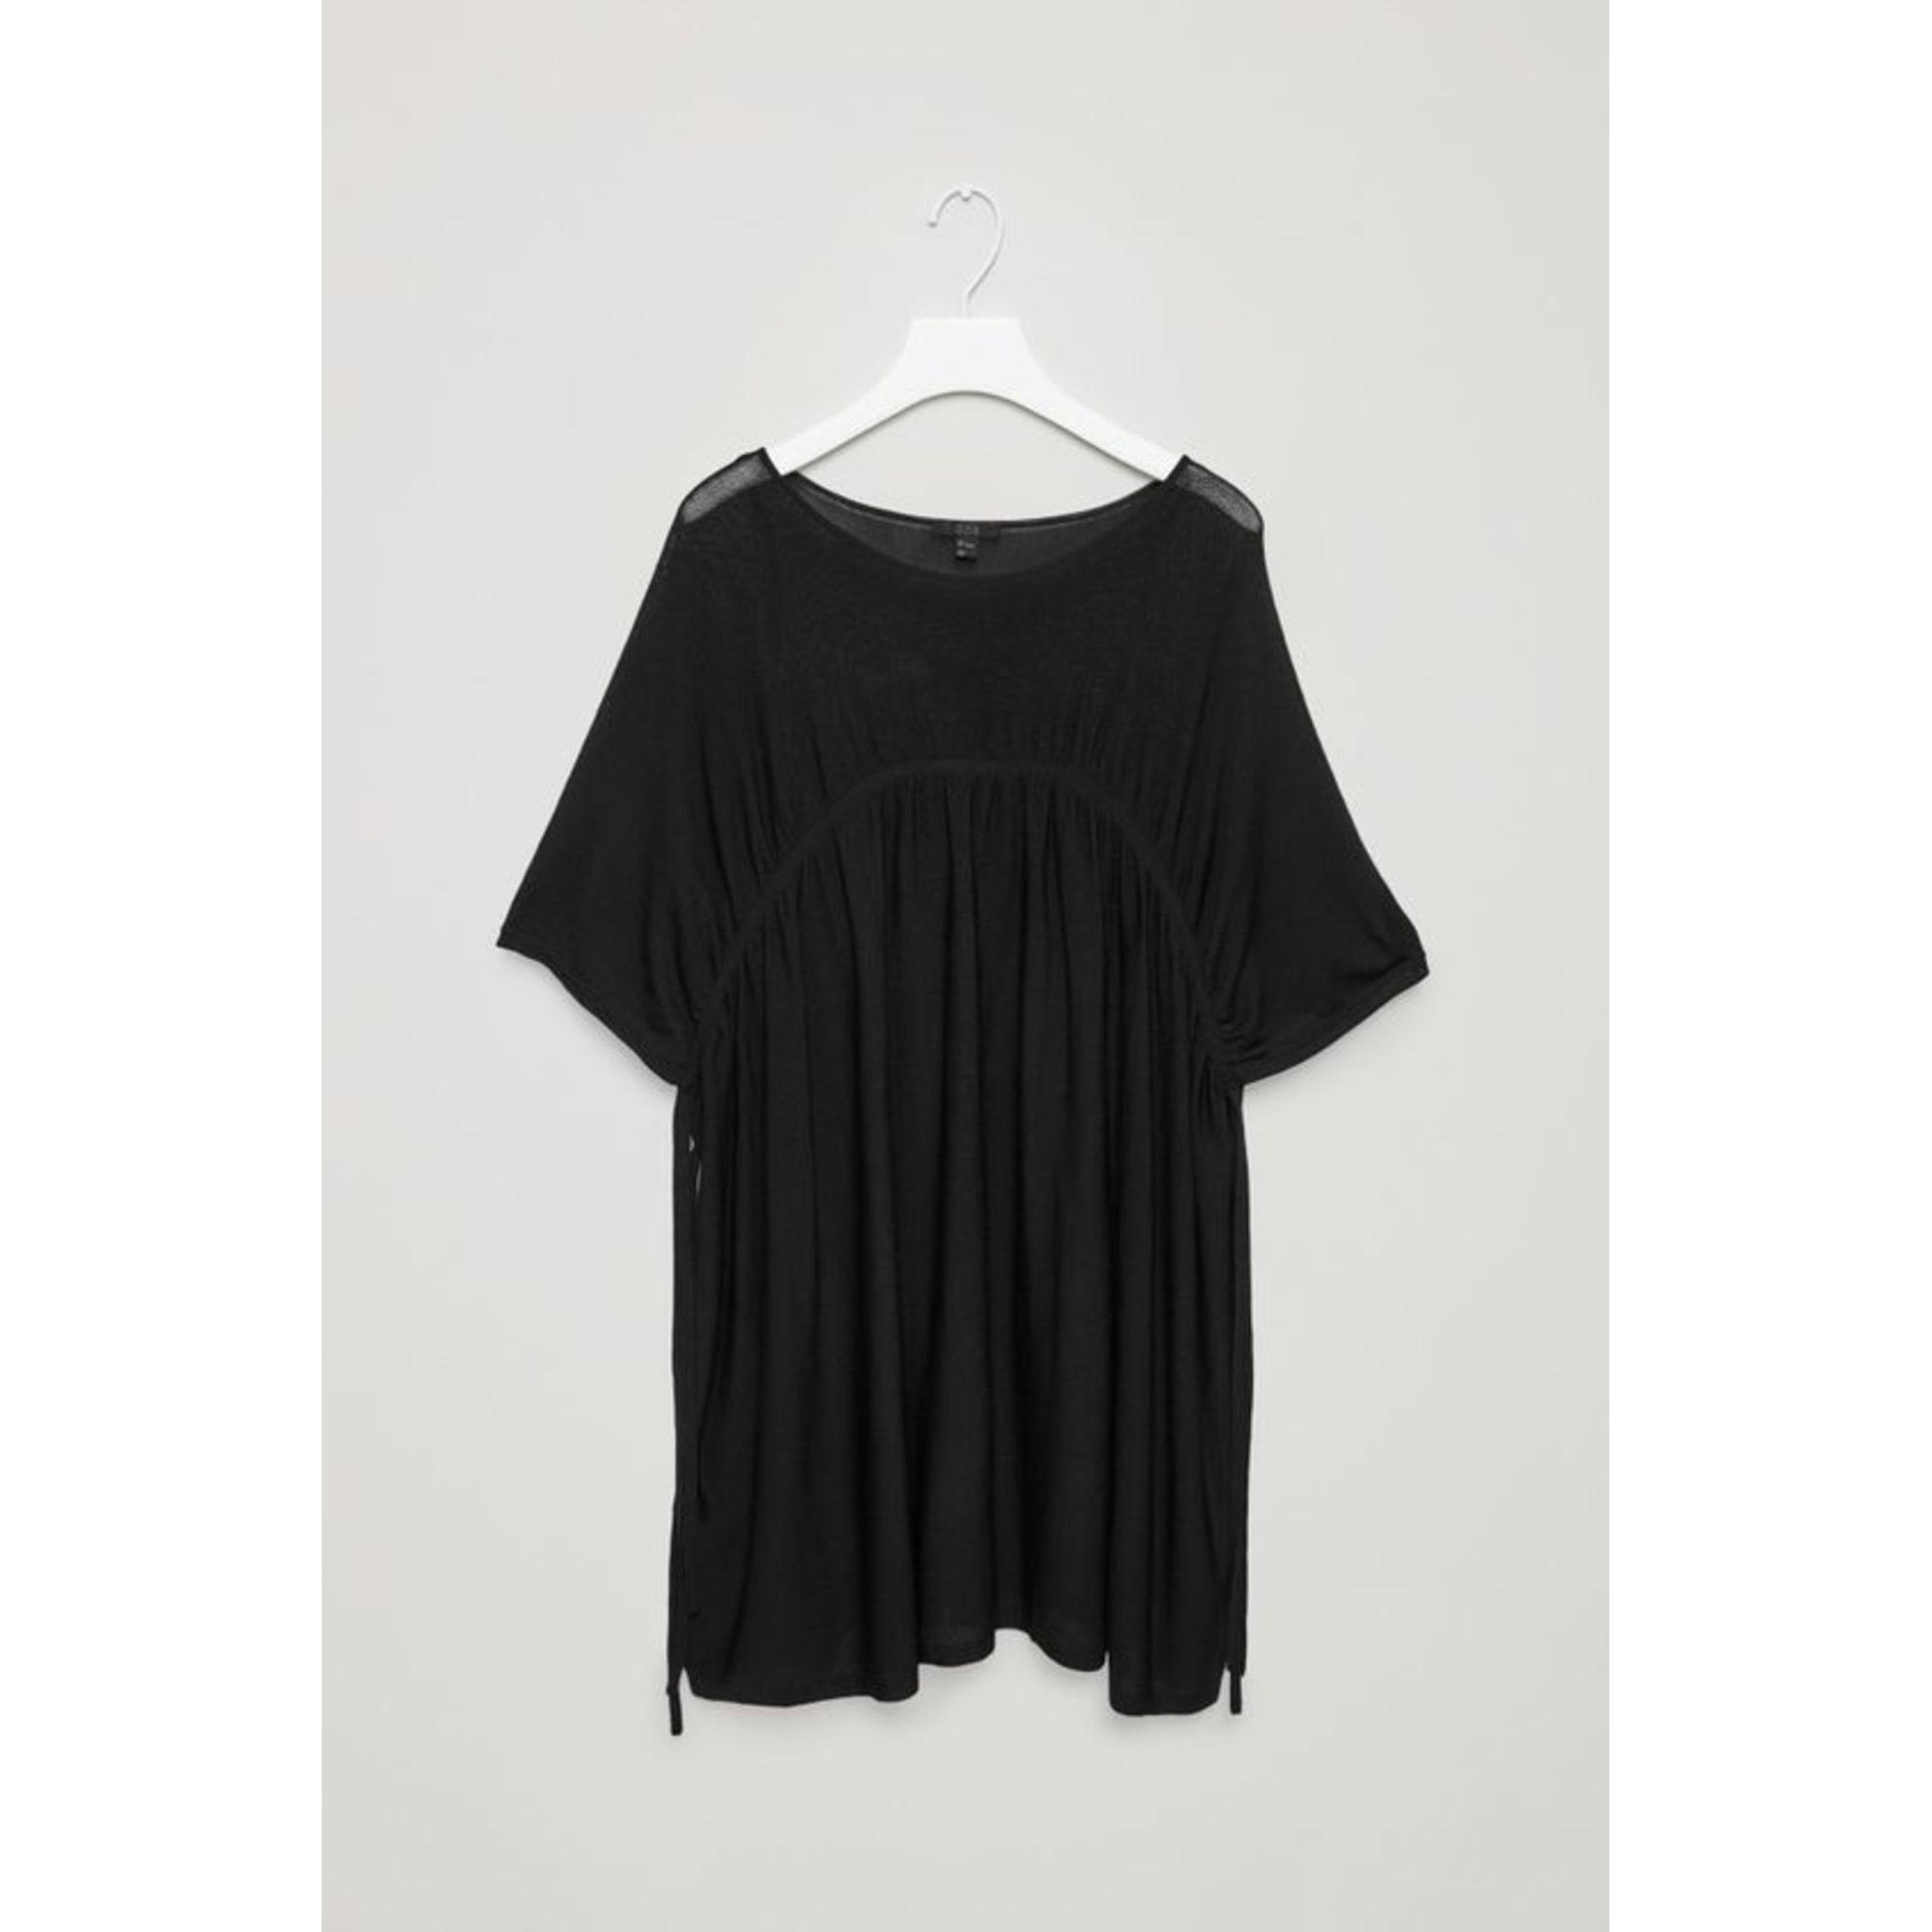 Top, tee-shirt COS Noir